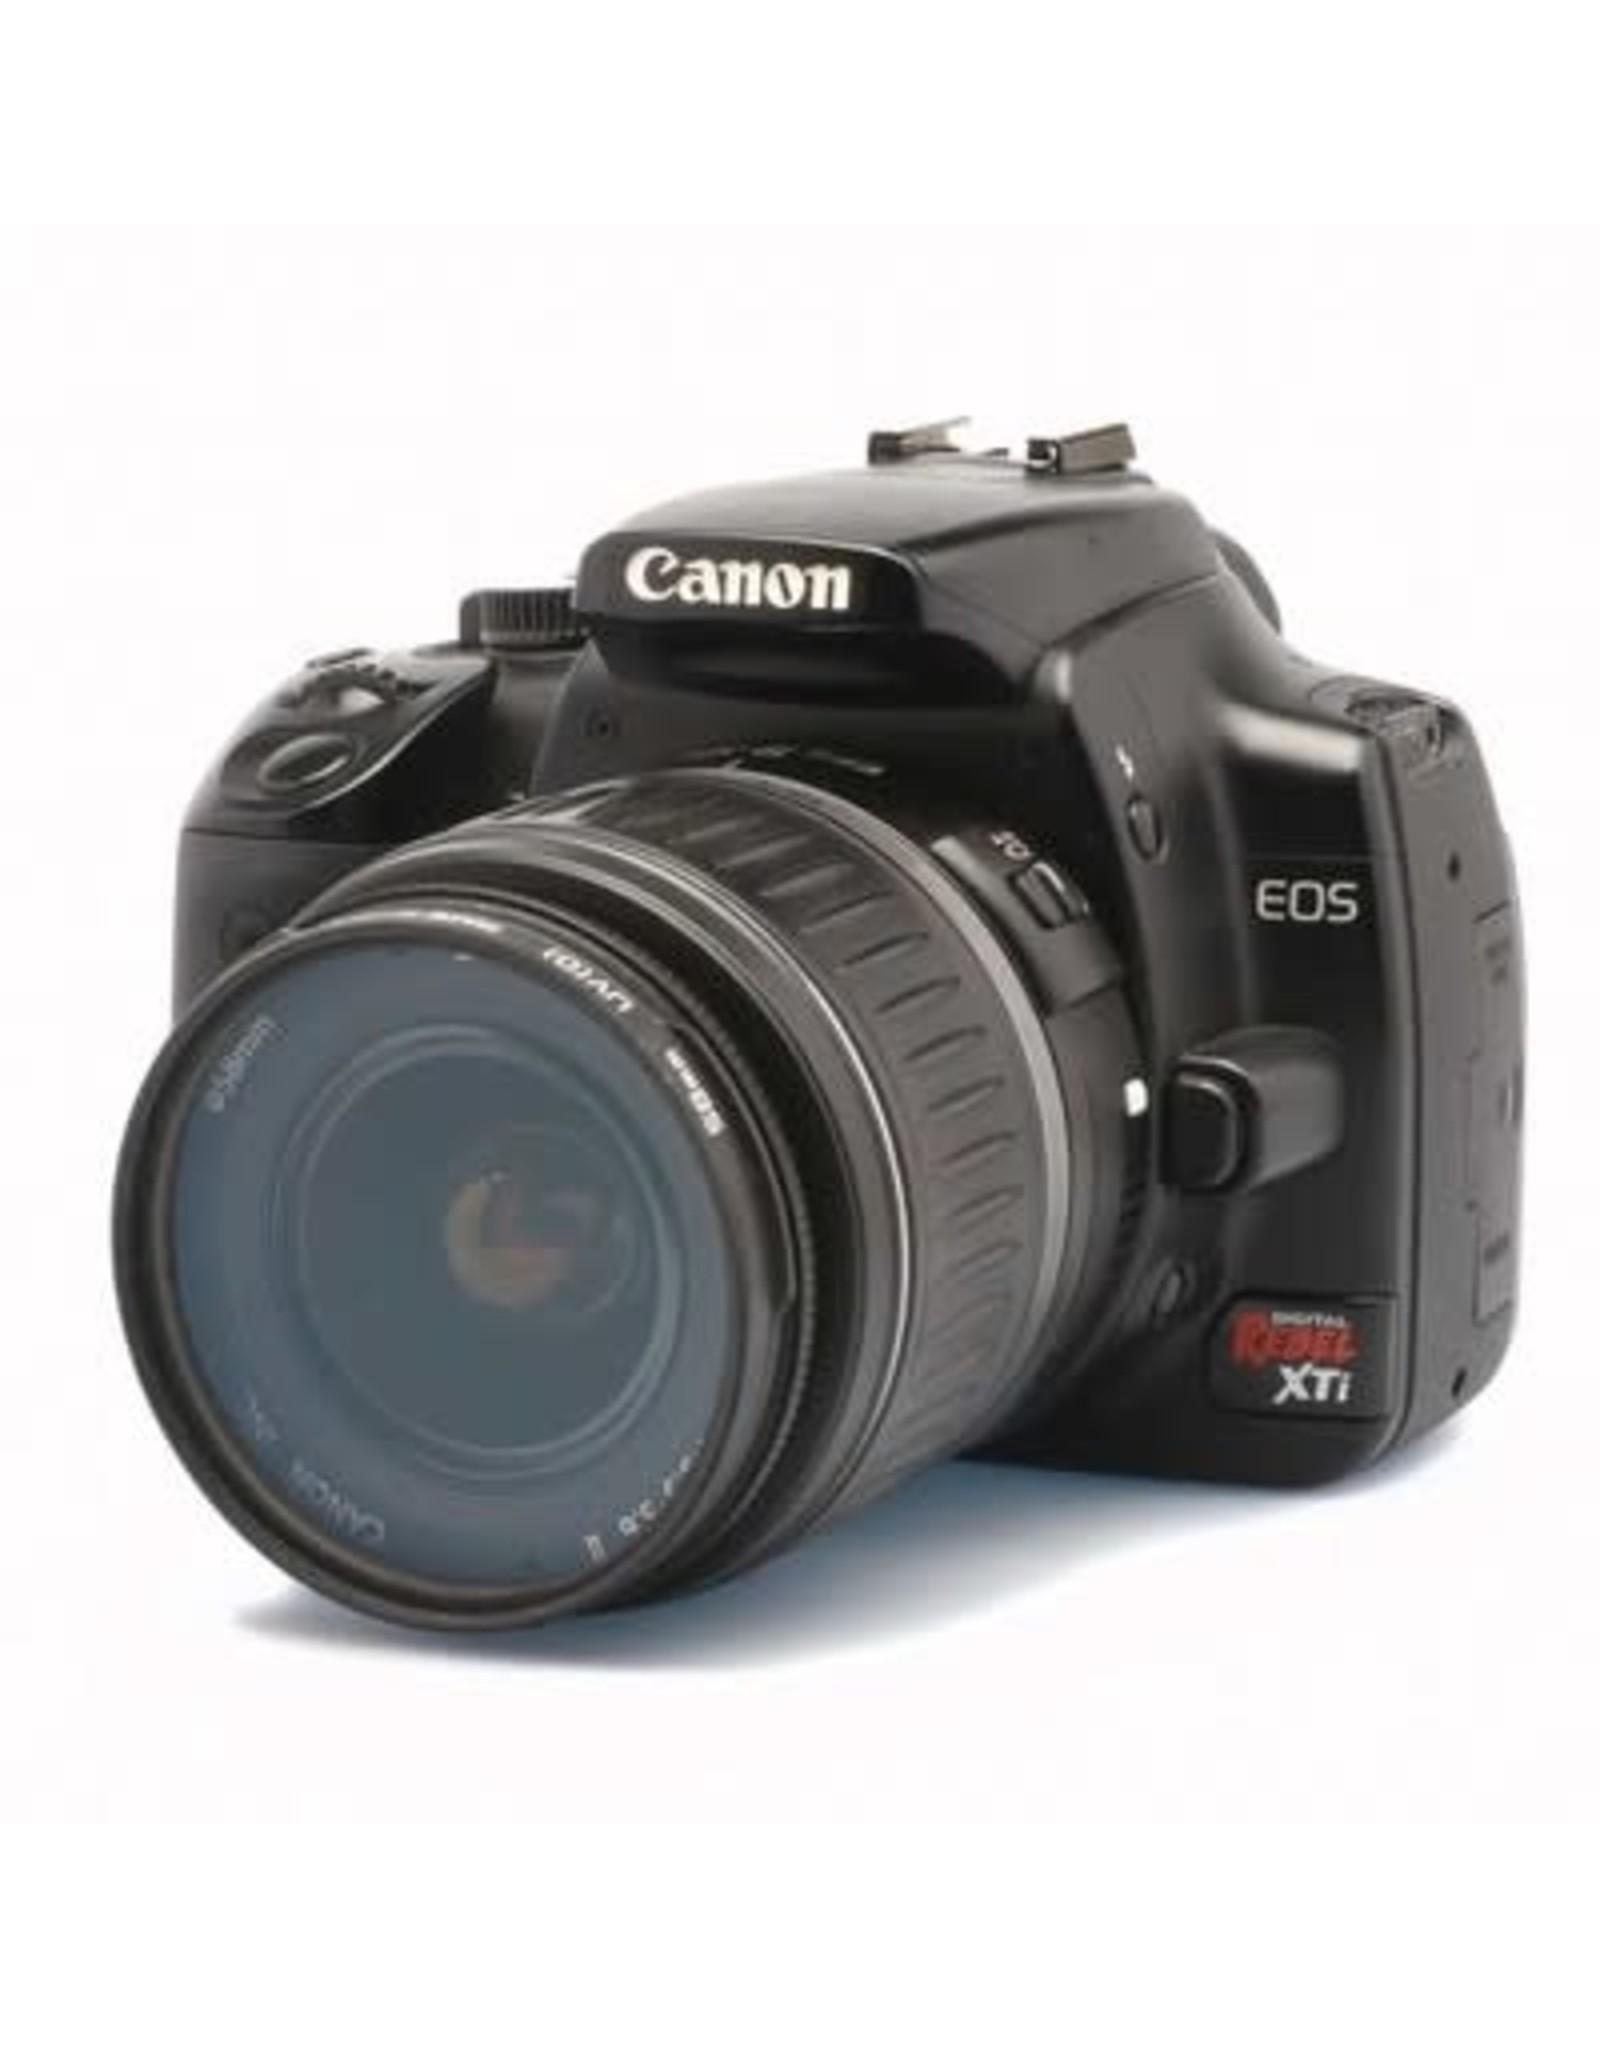 Canon Canon Digital Rebel XTi SLR w/18-55 f3.5-5.6 Kit Semester Rental 3